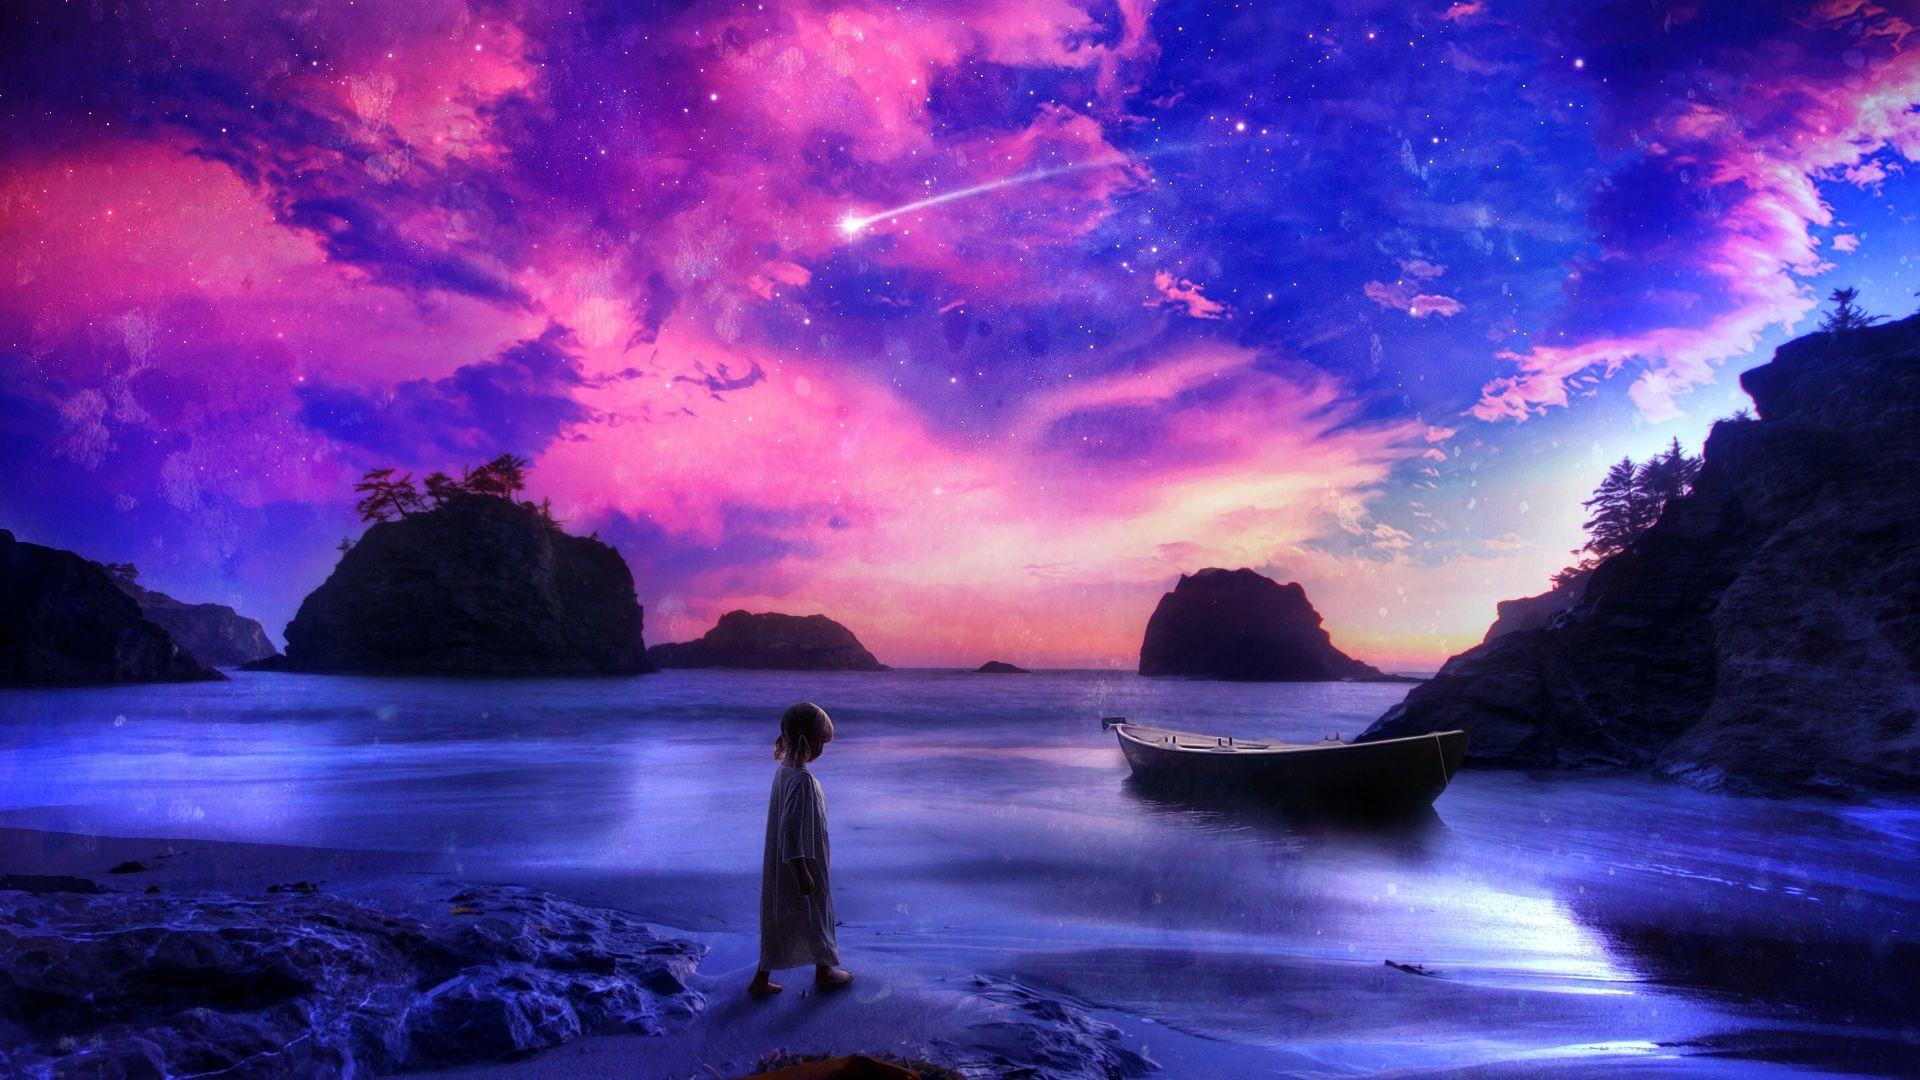 Child Shore Beach Purple Boat Stars Shooting Star fantasy ocean .